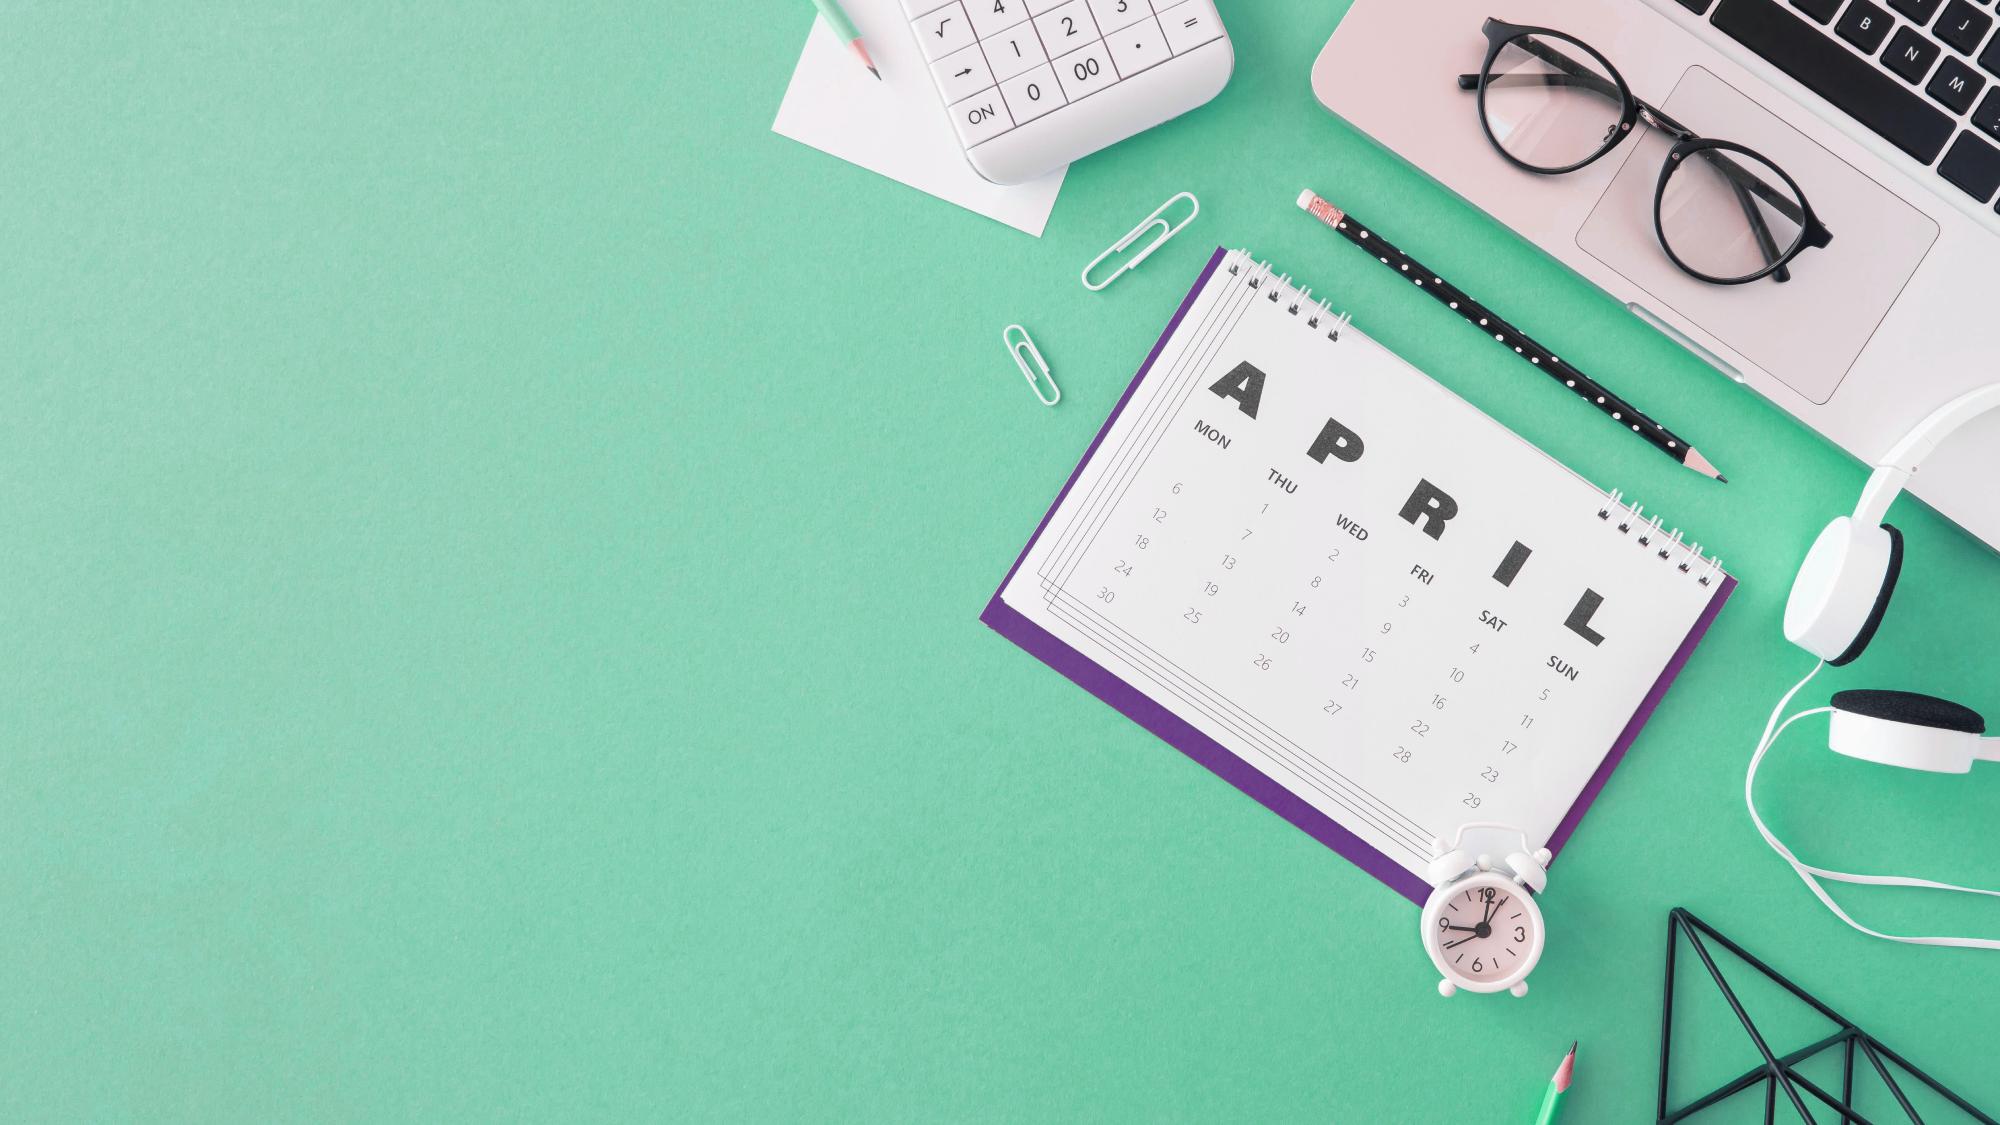 calendario para gestión de tareas